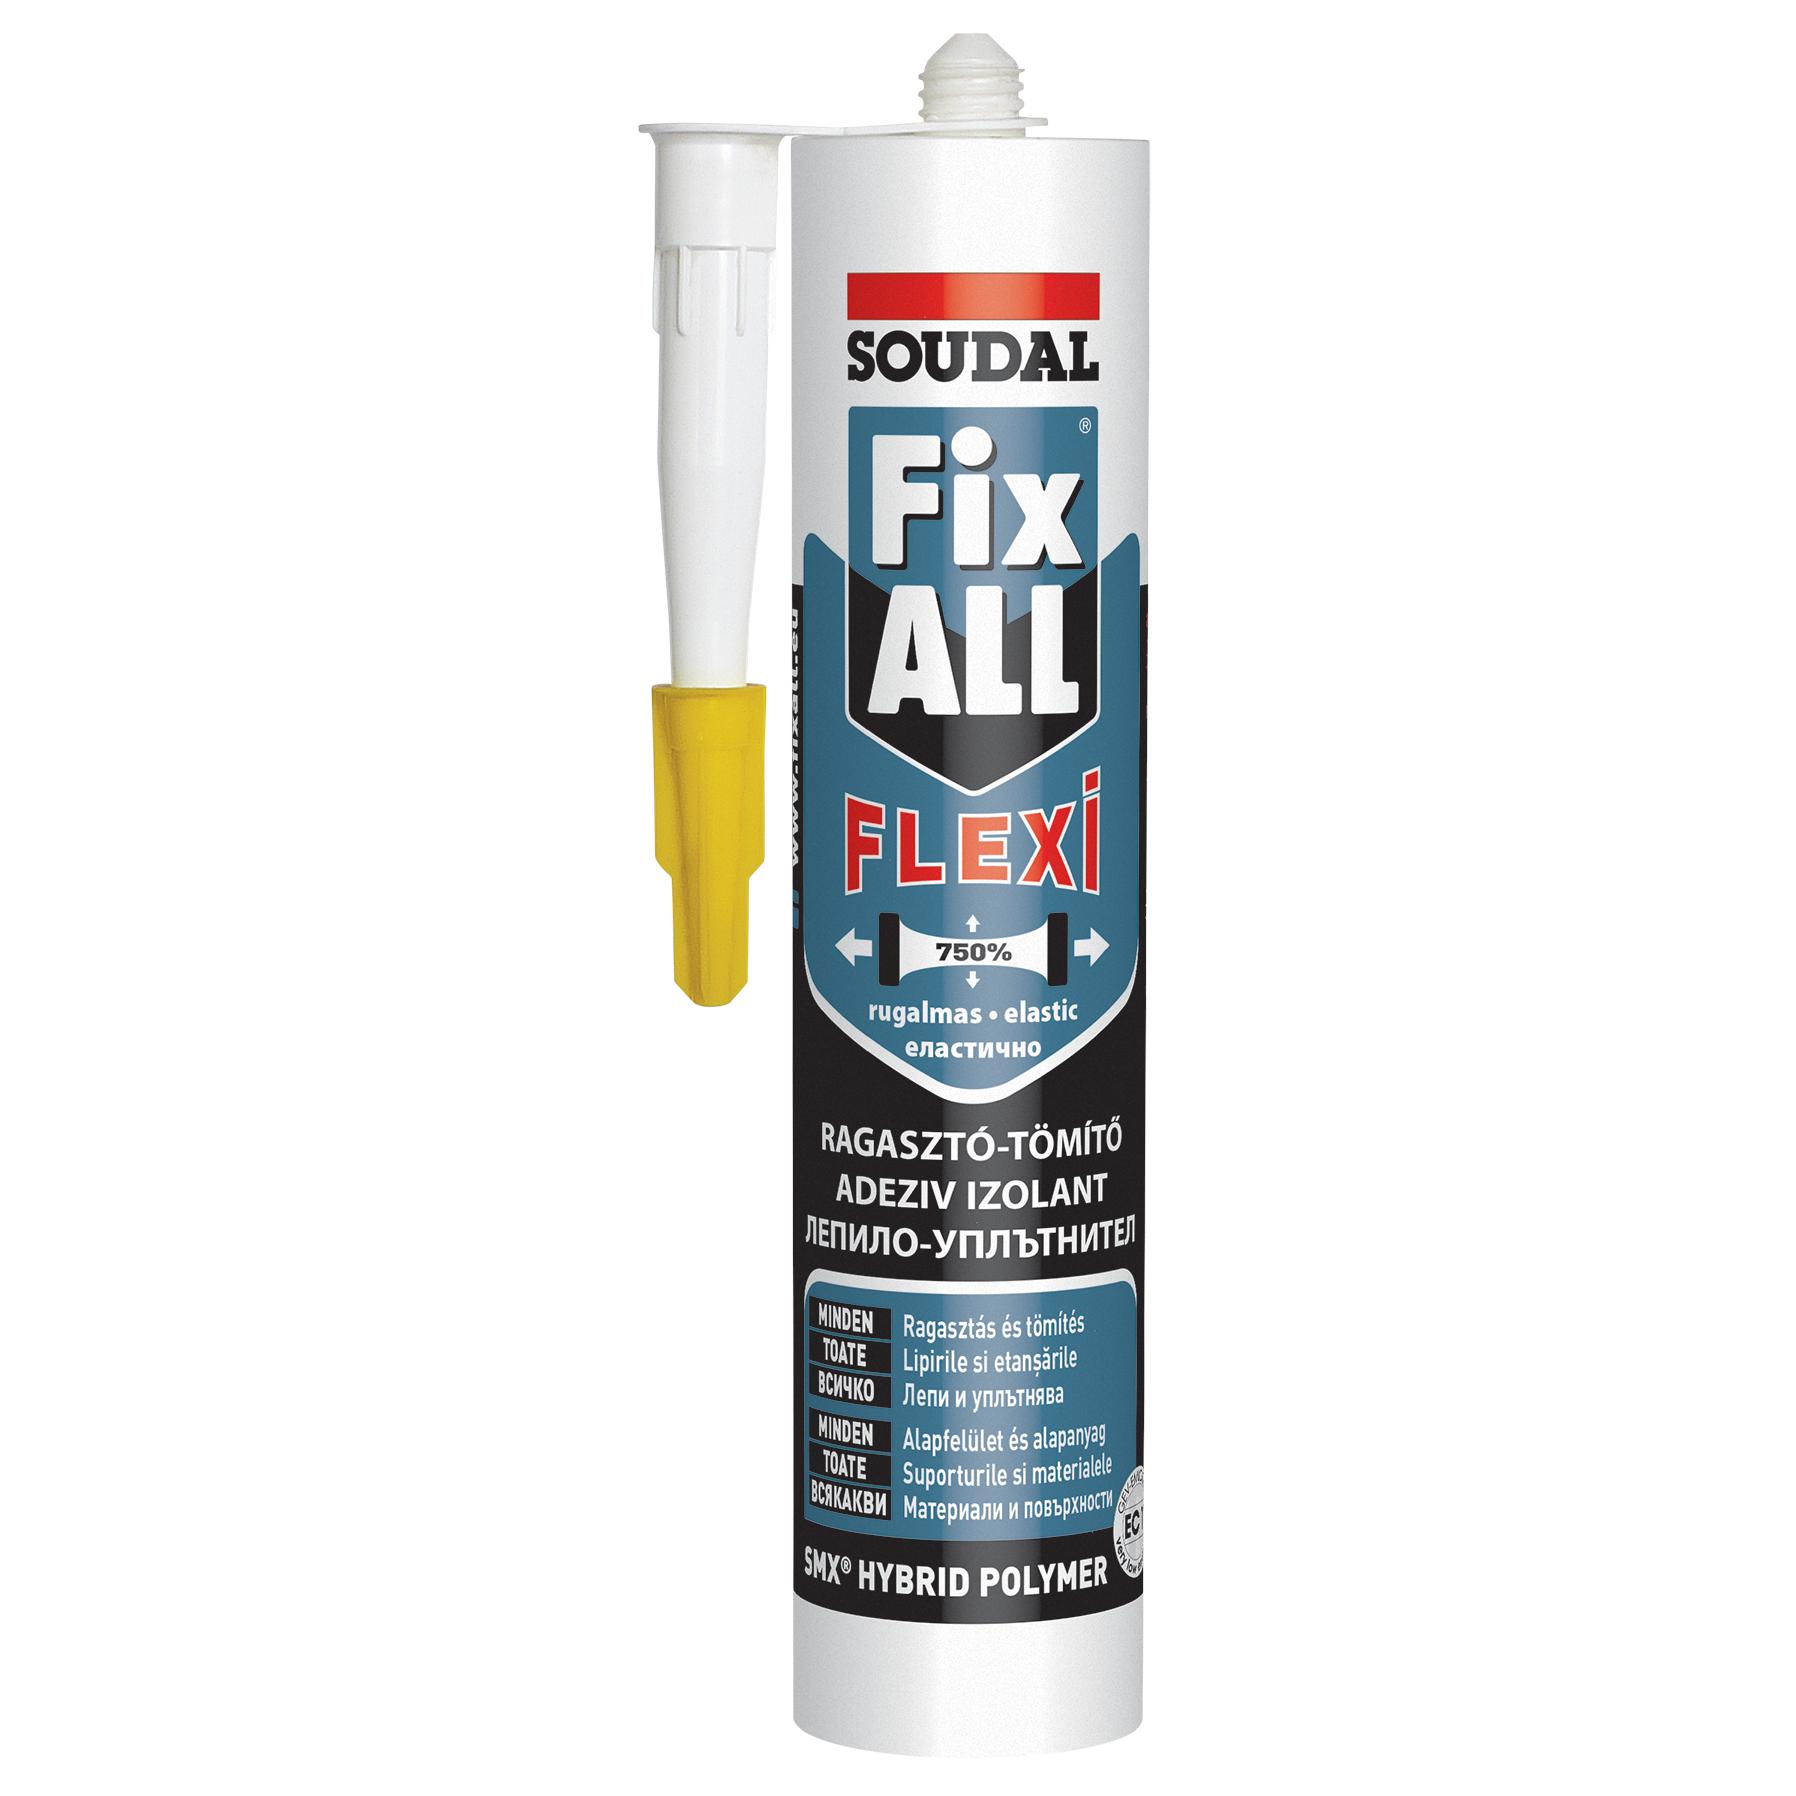 Adeziv Soudal Fix All Flexi, maro, 290 ml